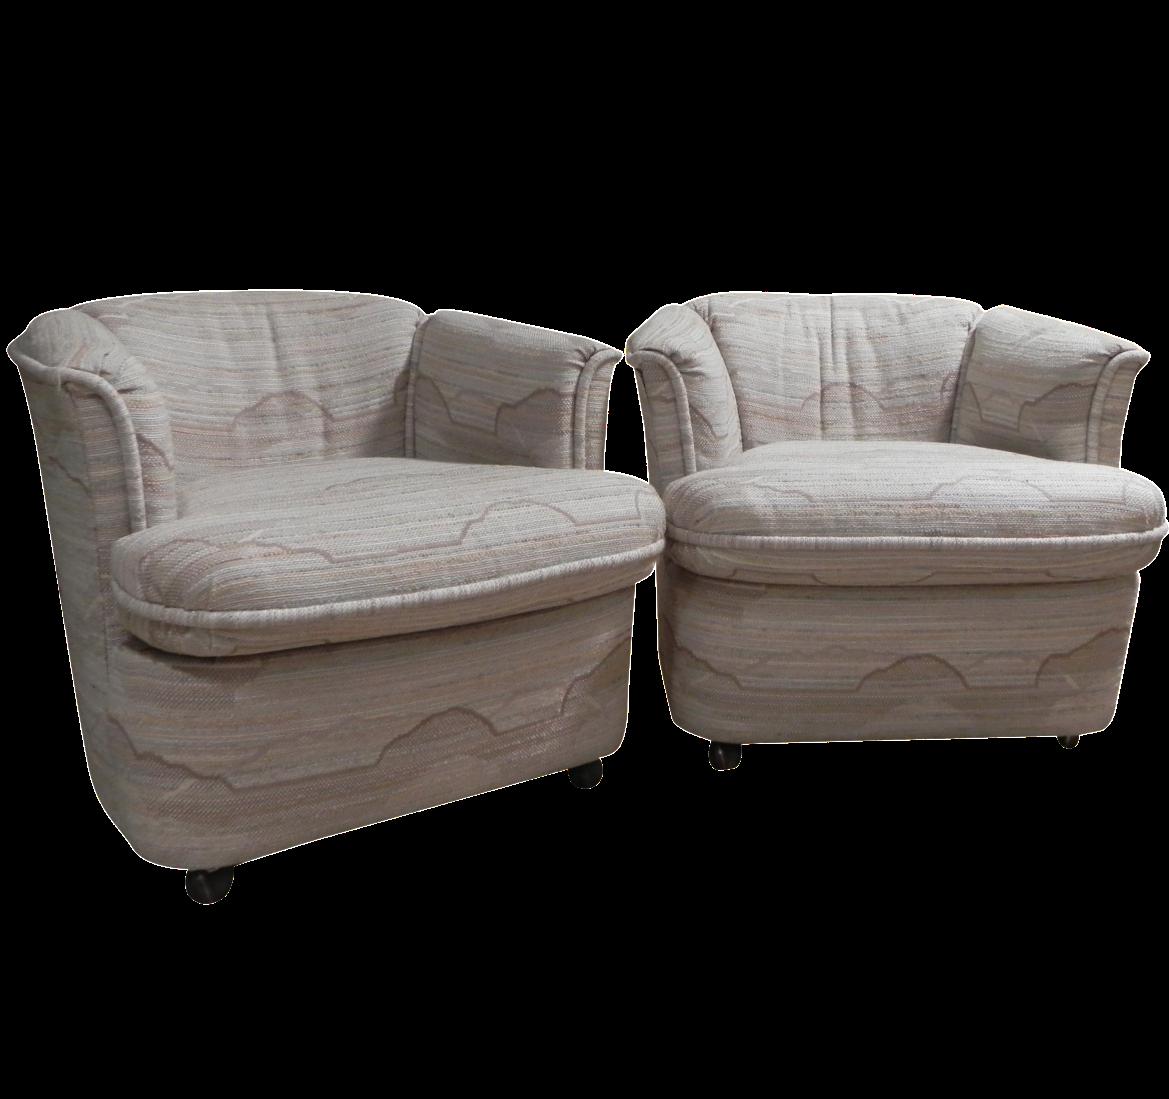 Drexel Contemporary Classics Barrel Chairs   Pair